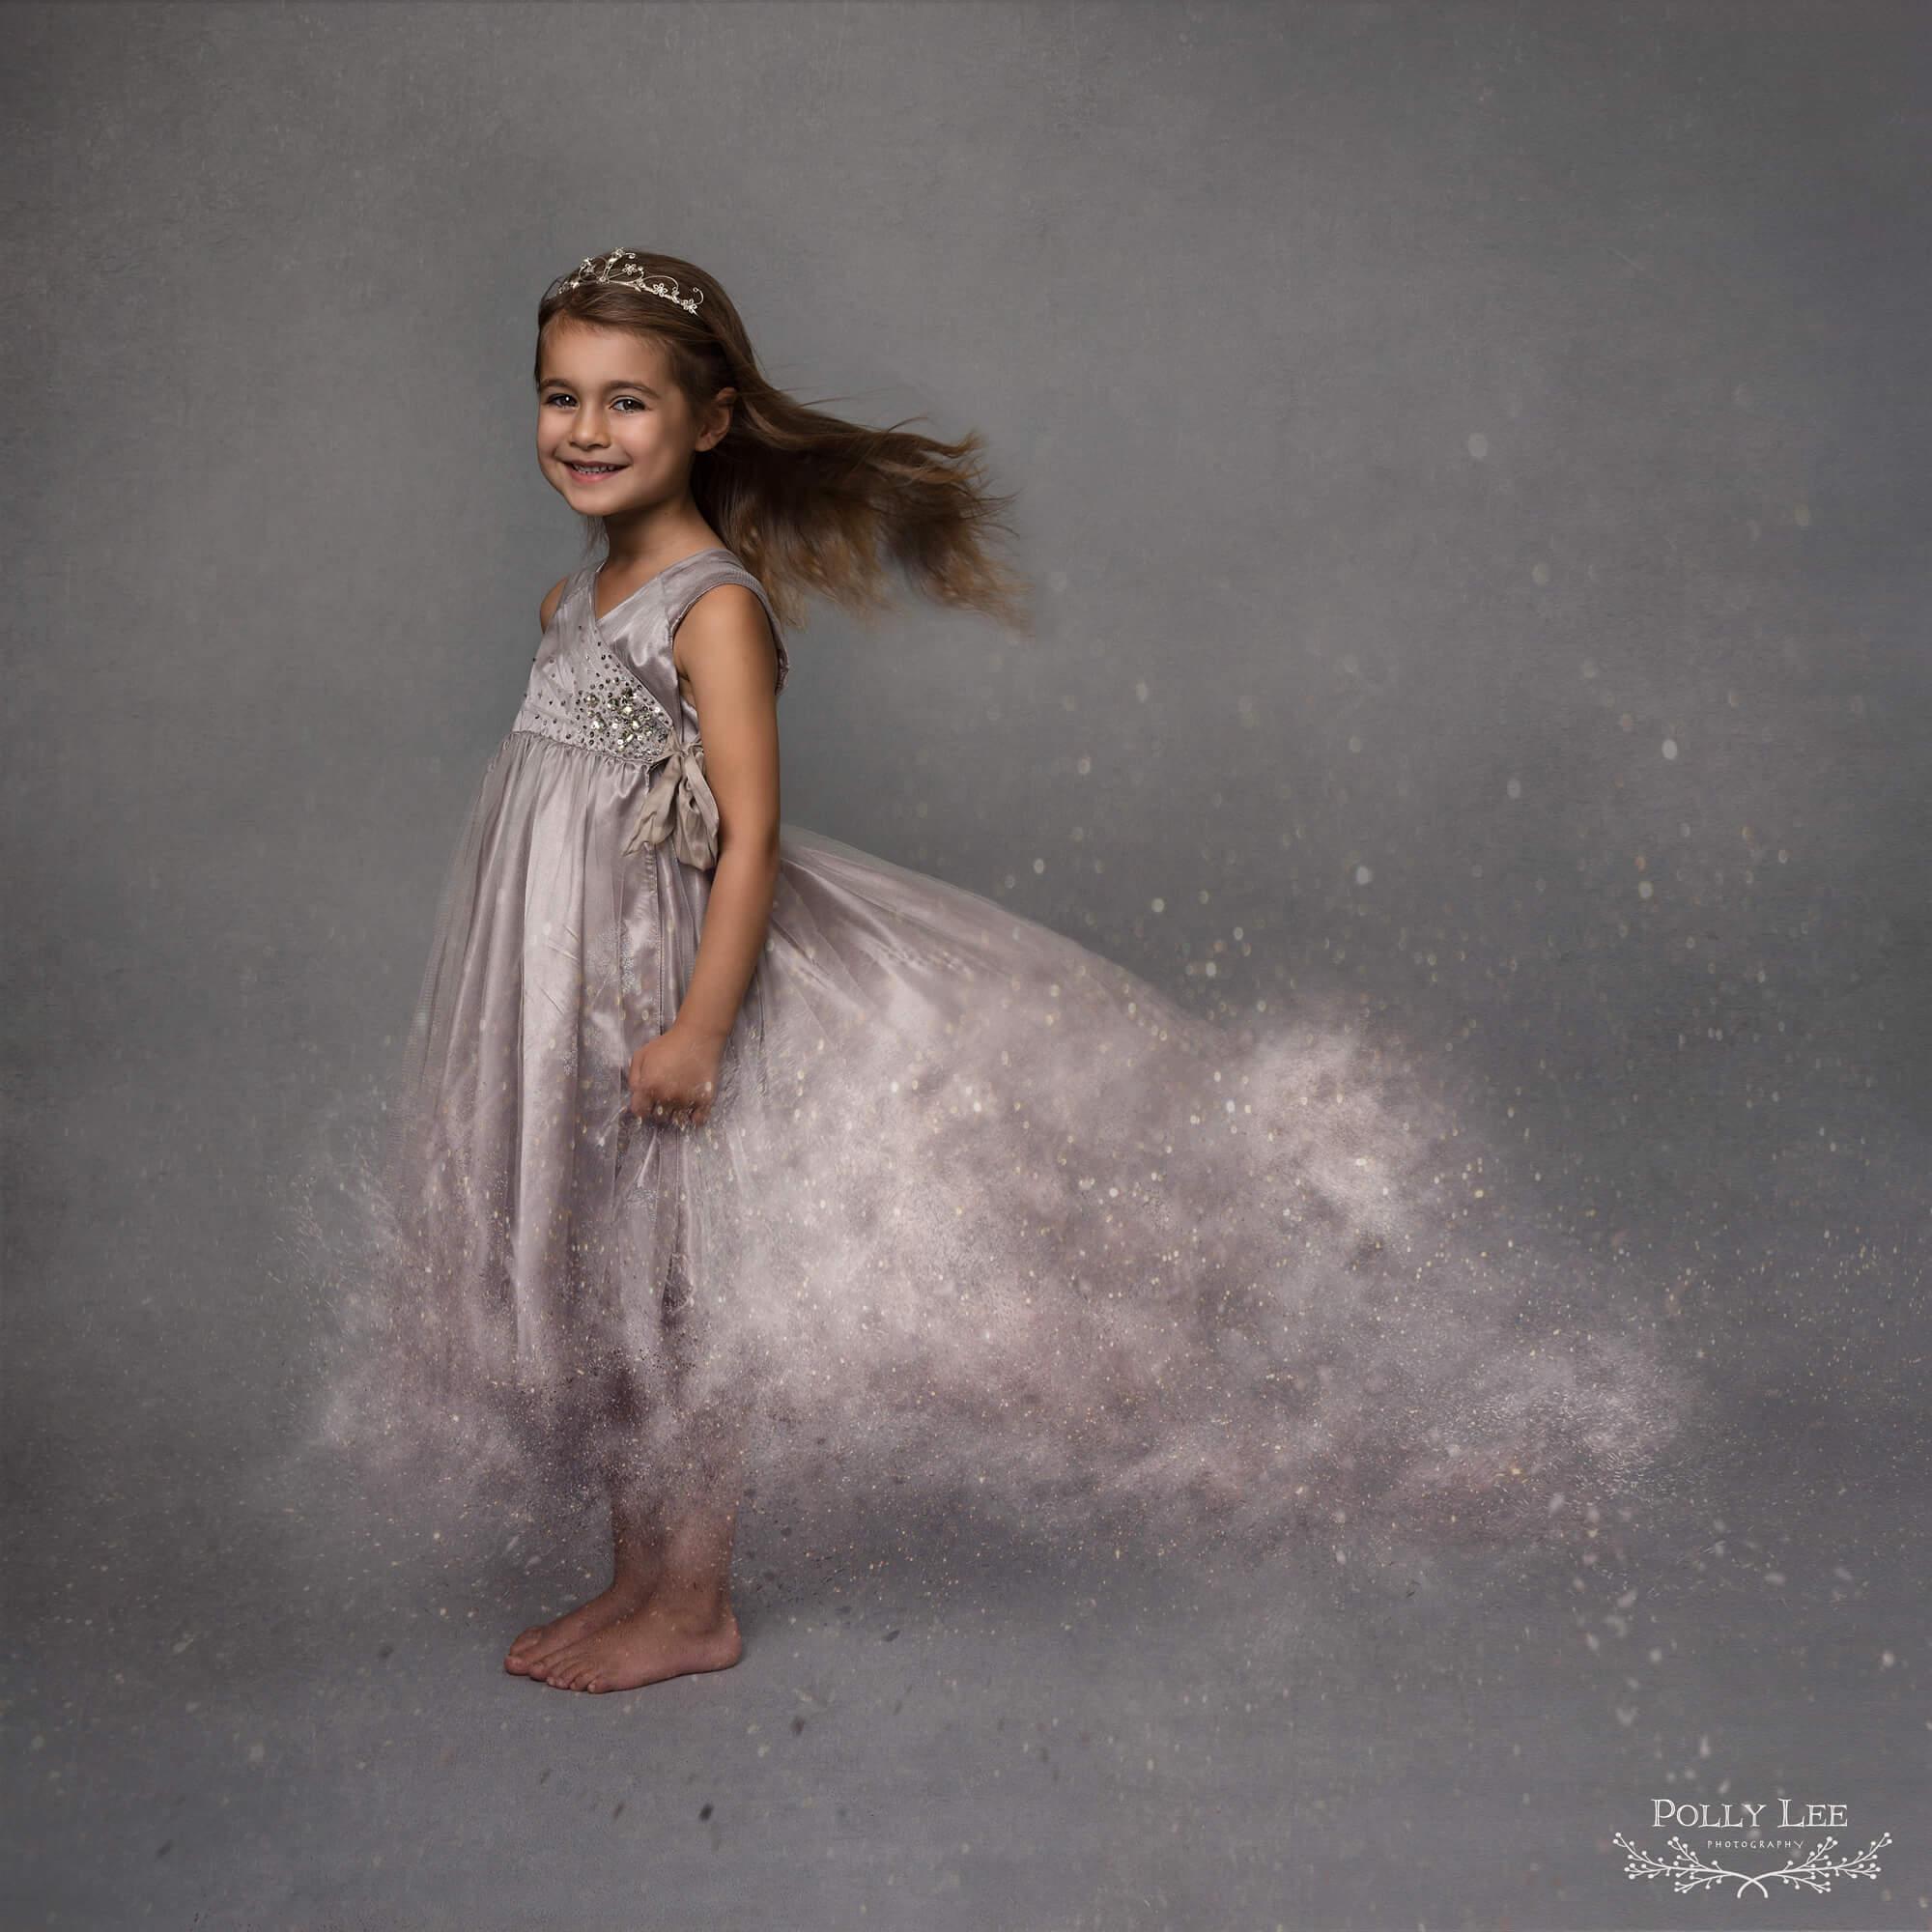 Child photgraphy